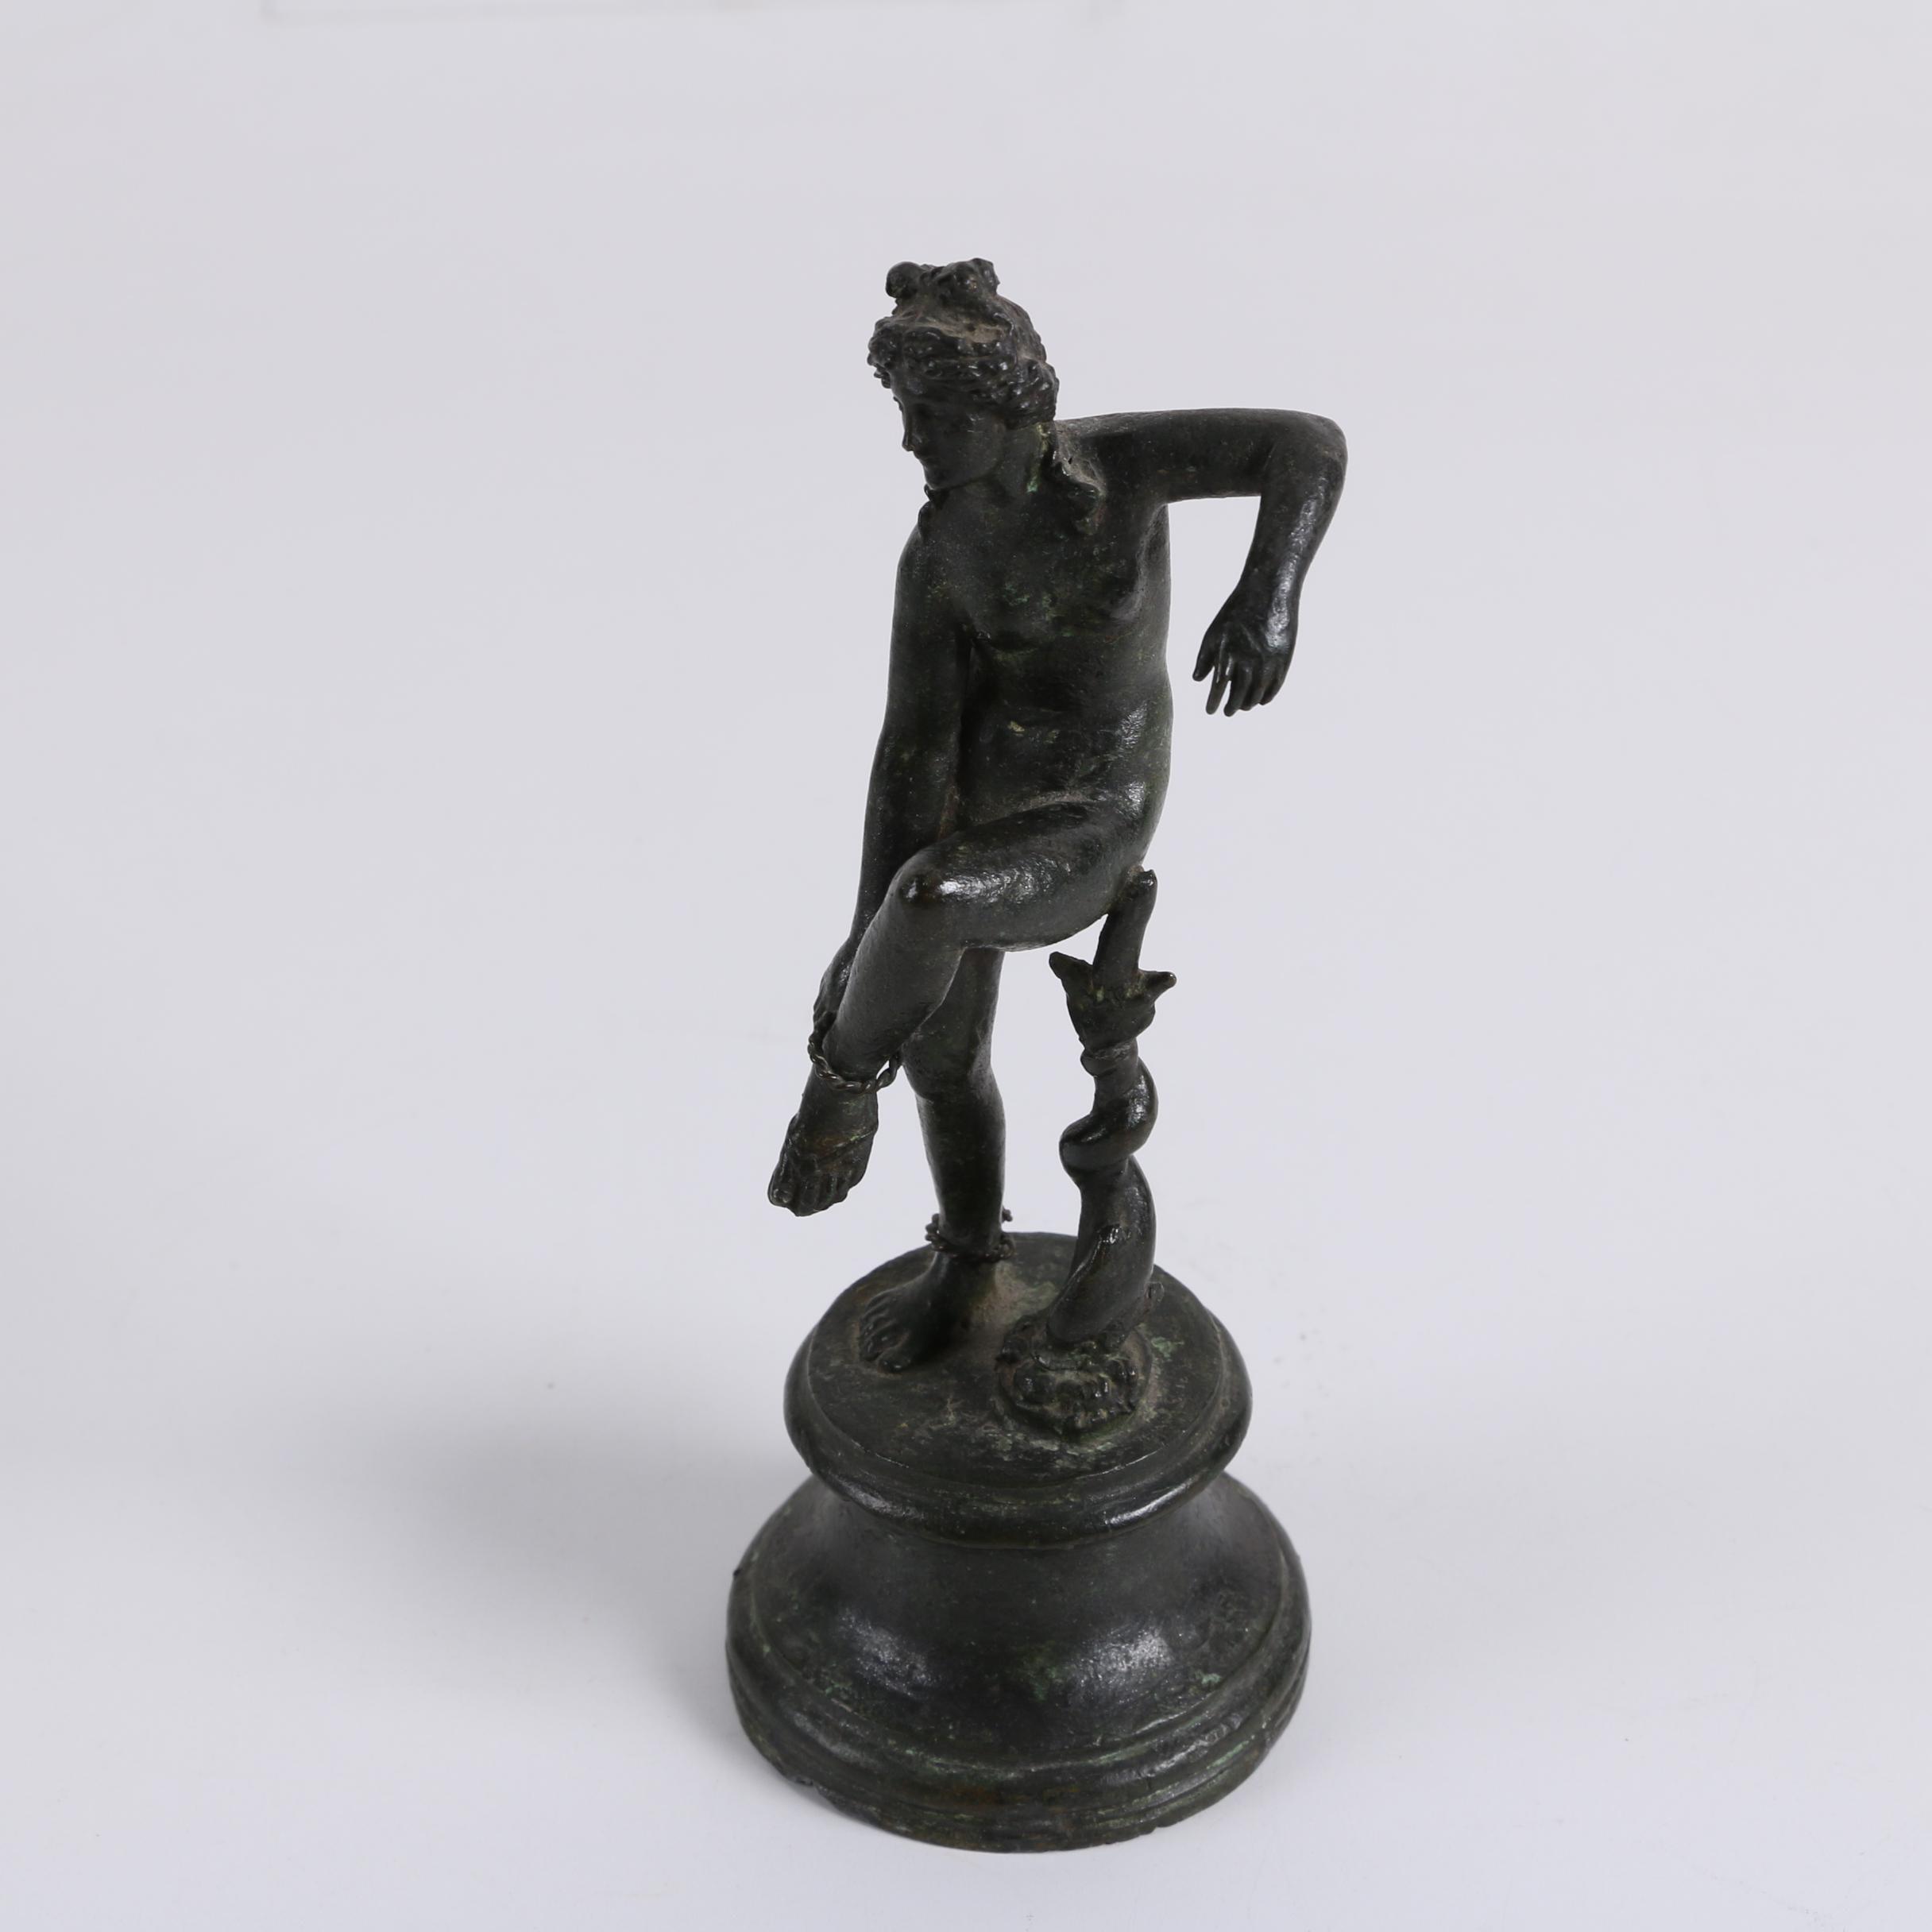 Vintage Classical Style Cast Metal Statuette